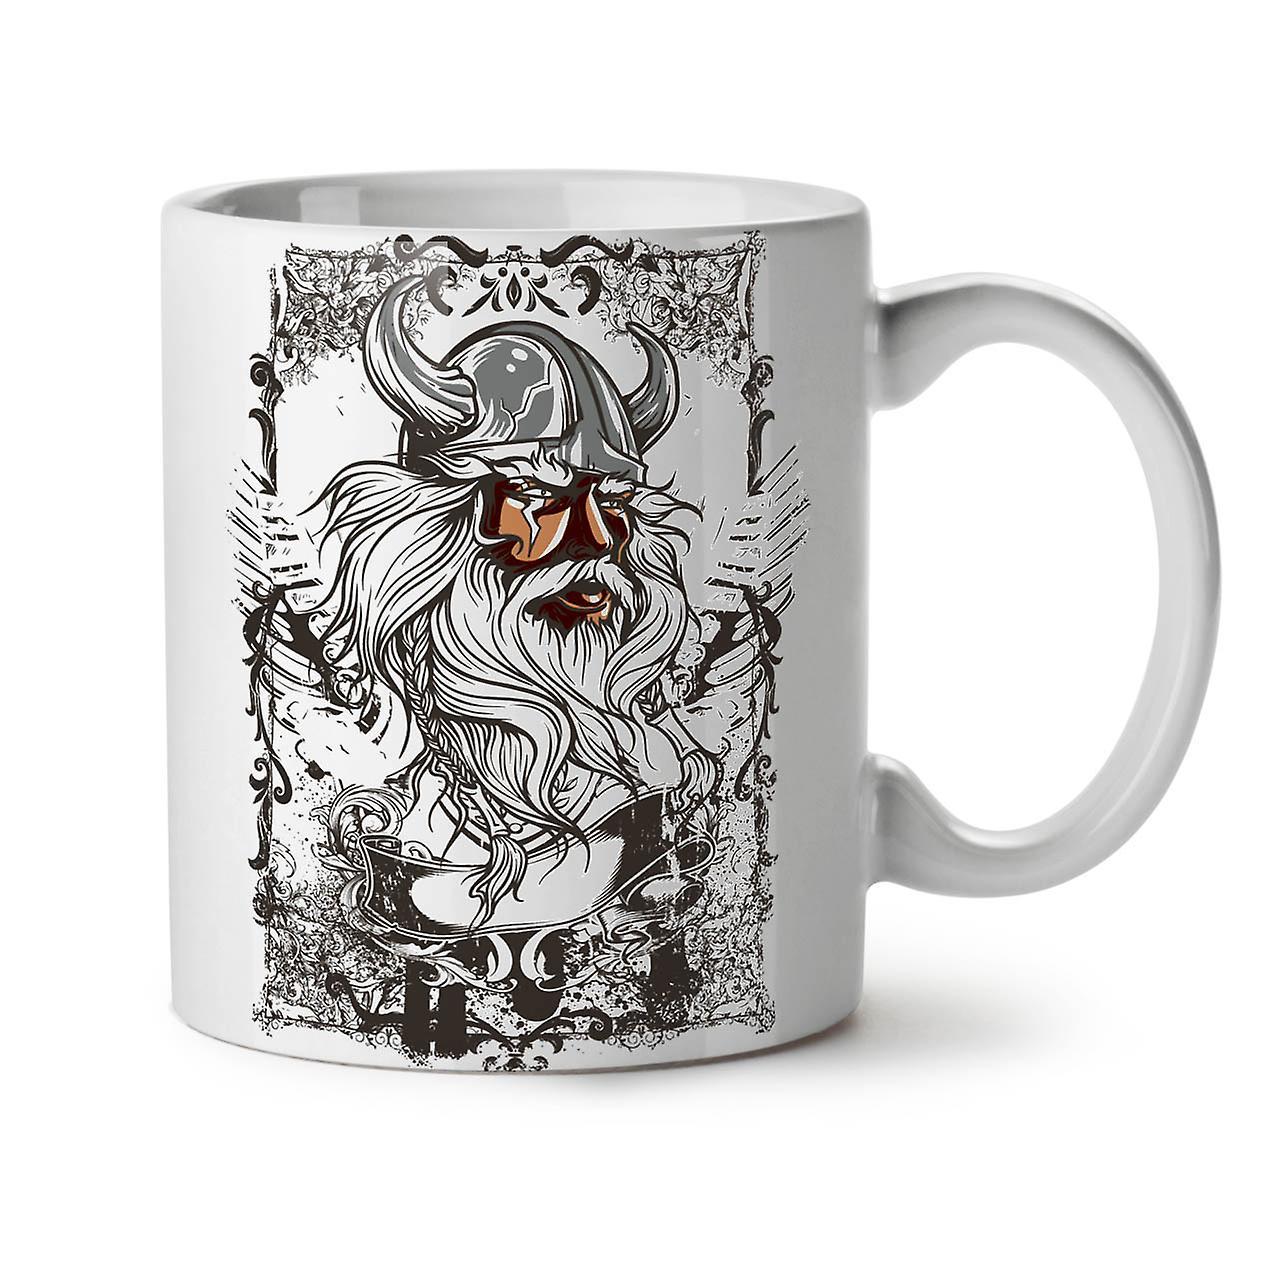 Face Ceramic North OzWellcoda Warrior Coffee Mug 11 Tea New White T1JcKlF